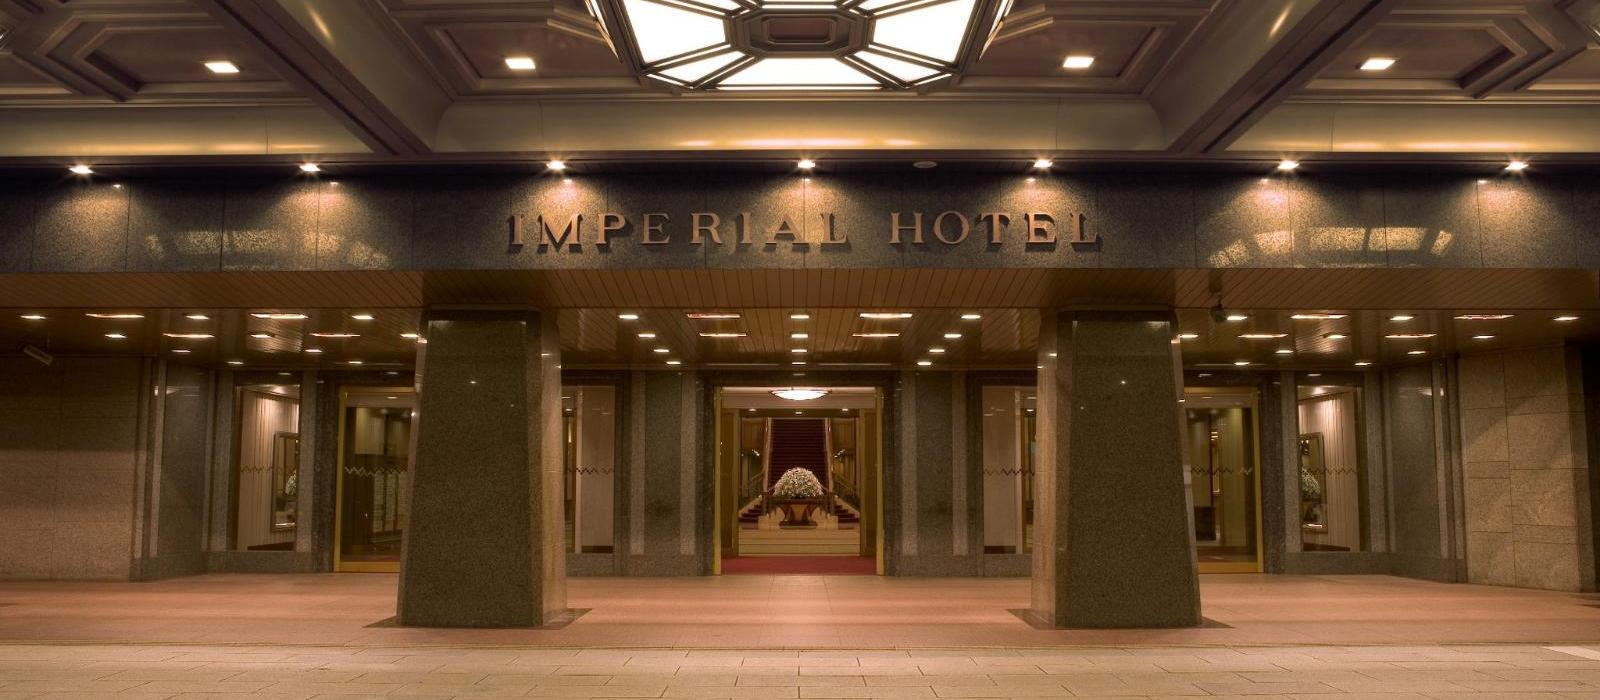 東京帝國酒店(Imperial Hotel Tokyo) 酒店入口圖片  www.yisecj.live